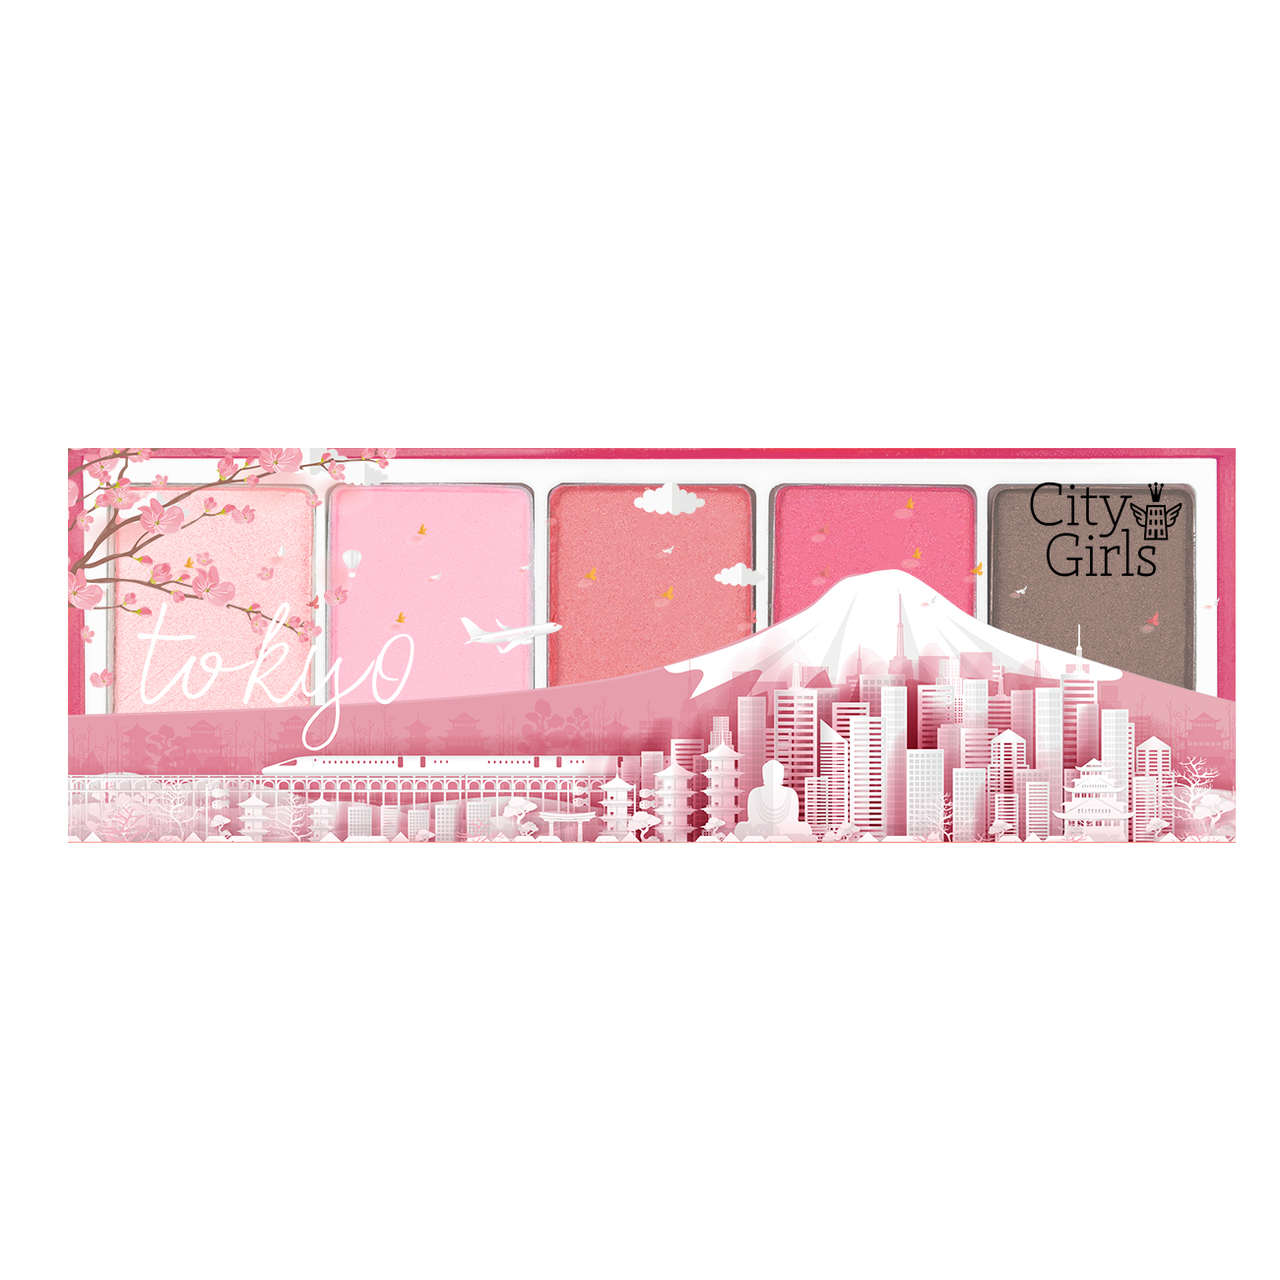 Paleta de Sombras 5 cores Coleçao Mundo Tokyo / Toronto City Girls